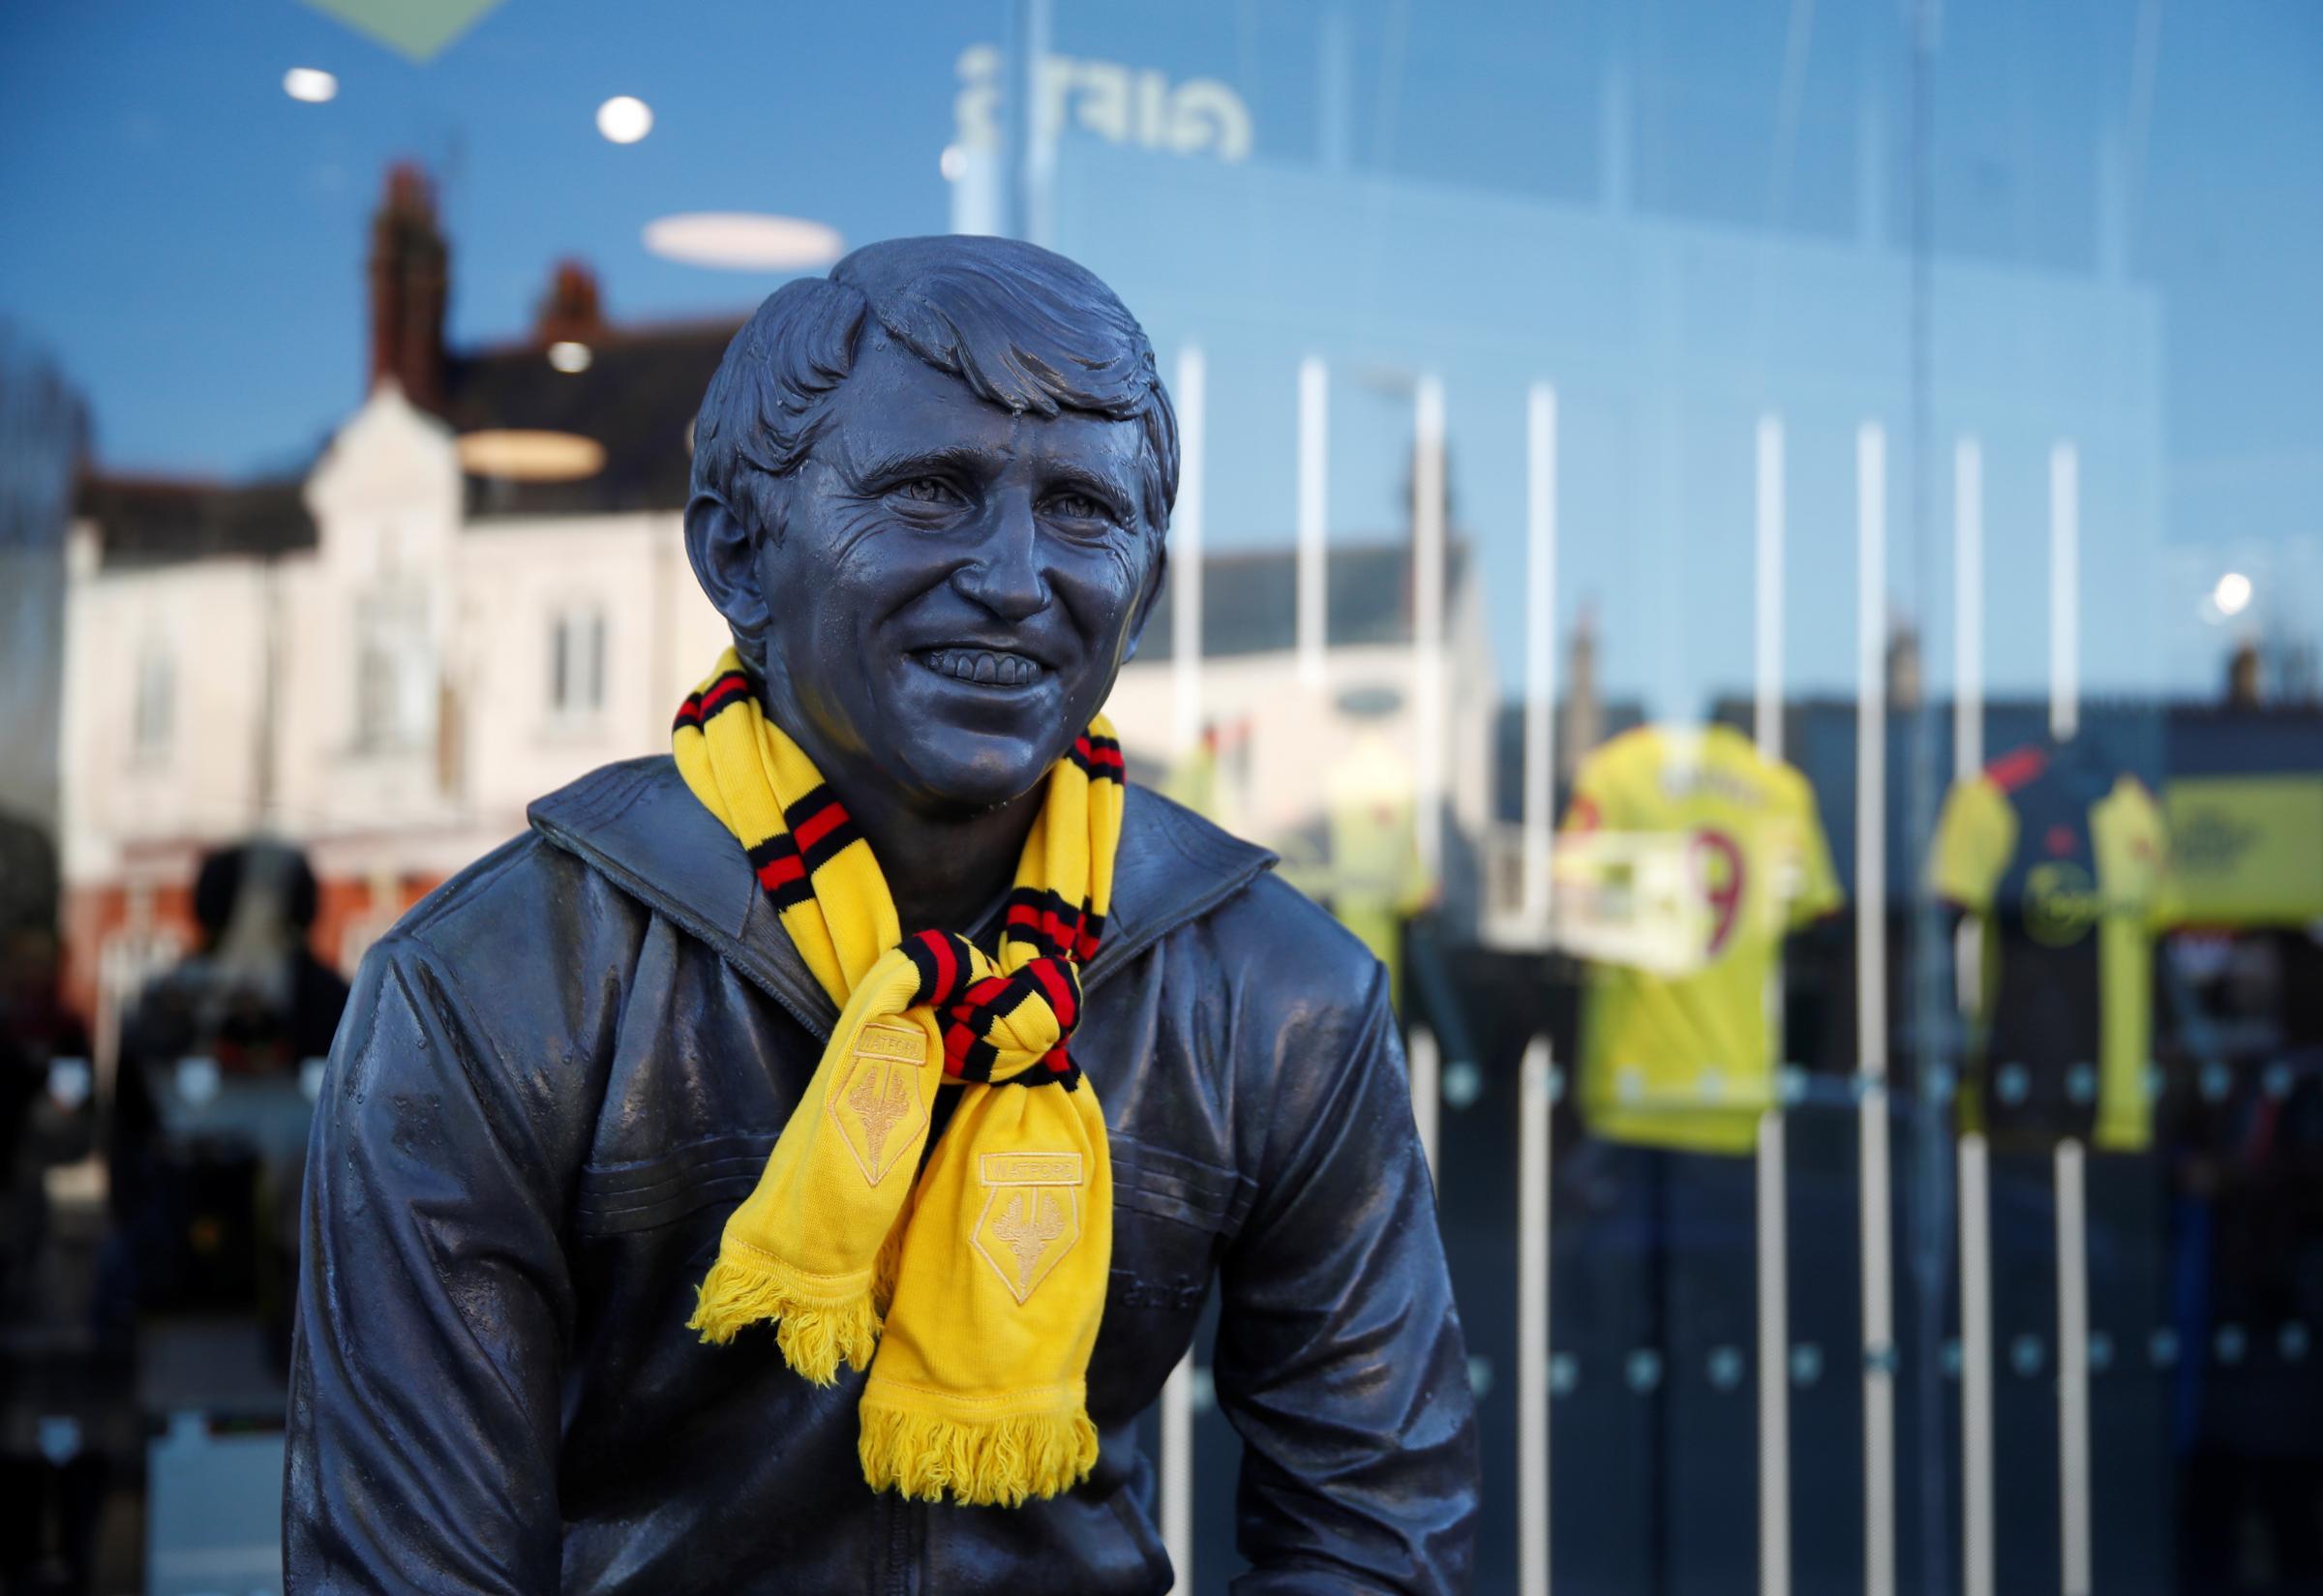 Watford continue push for survival against Tottenham Hotspur